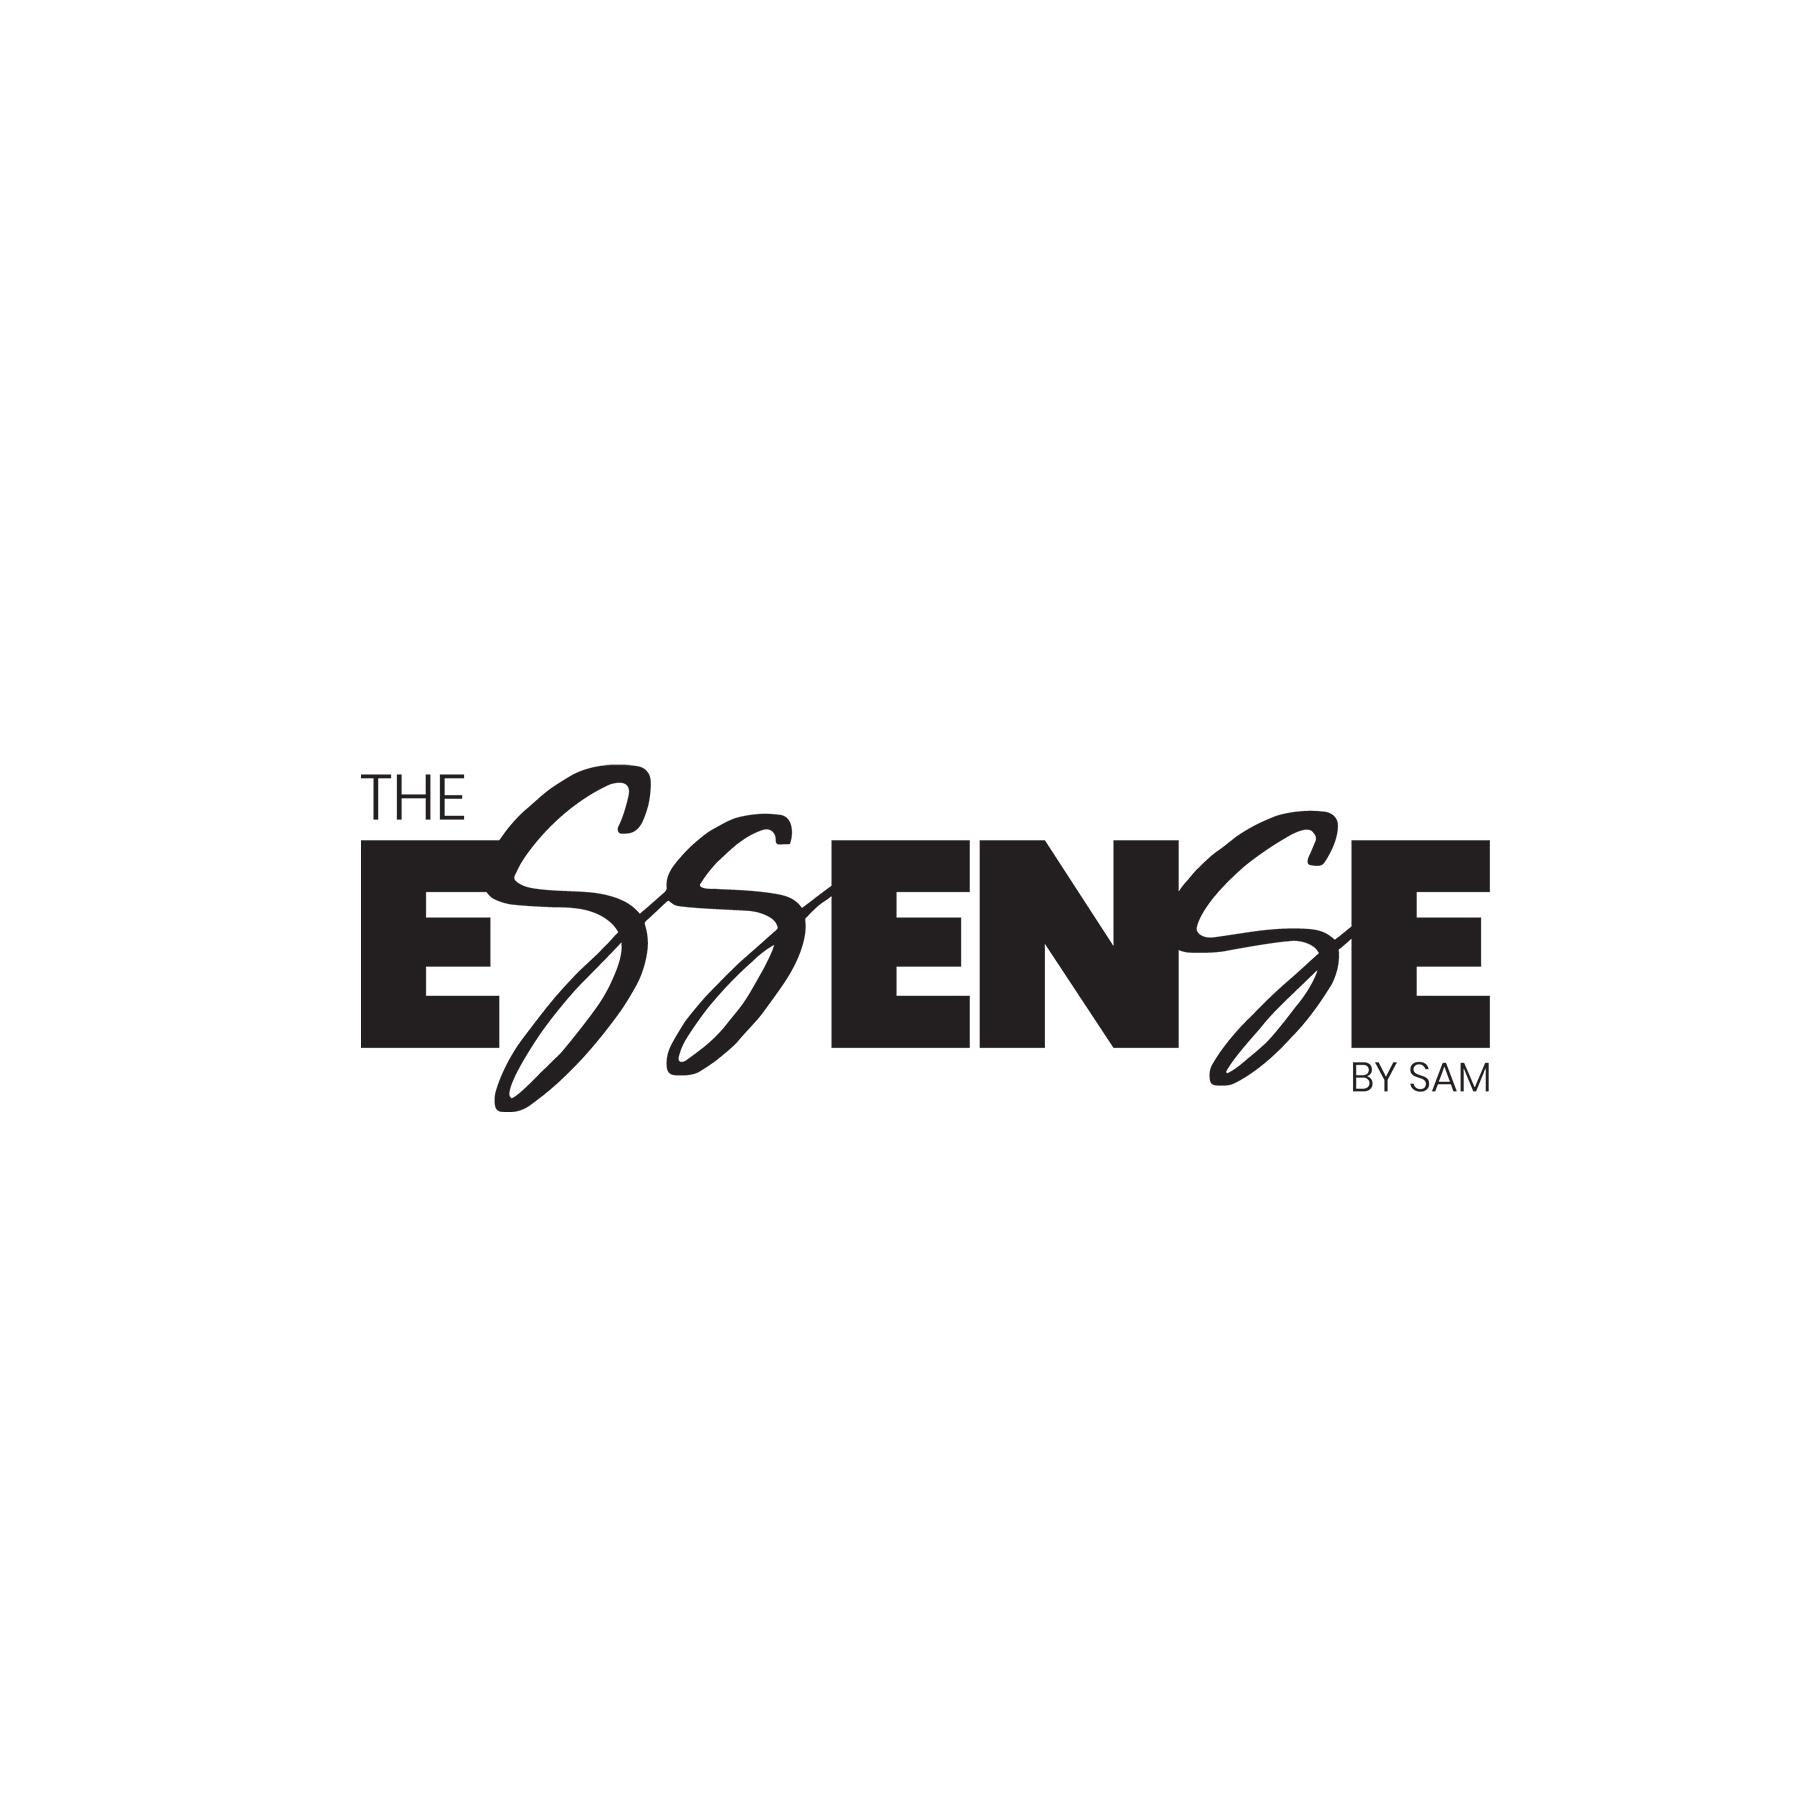 the essense by sam